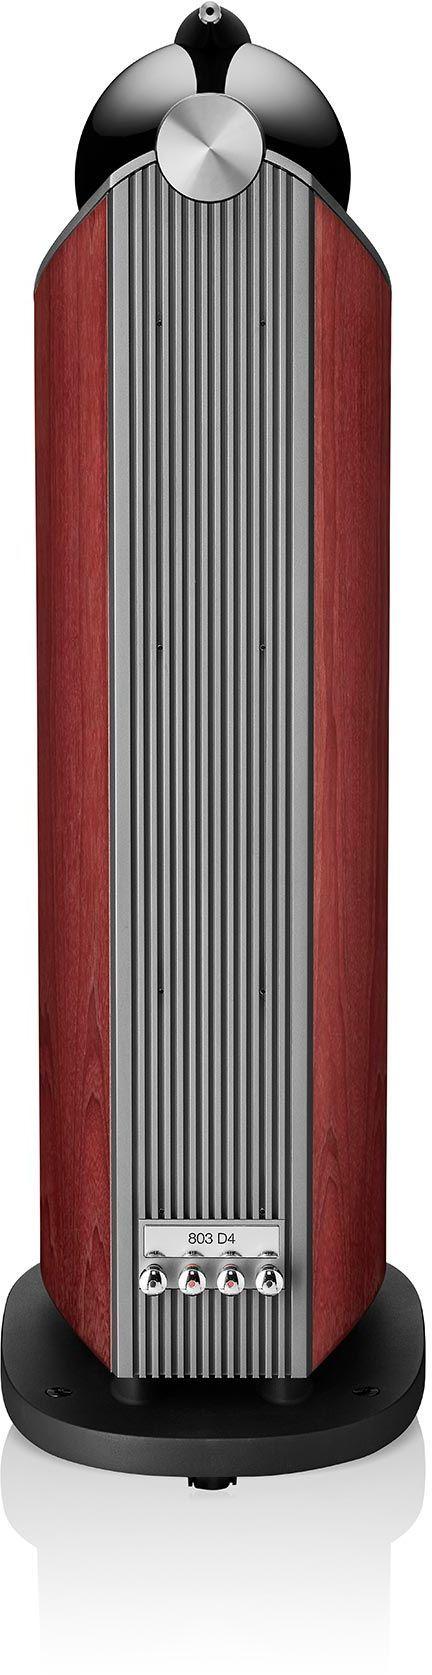 Bowers & Wilkins 803 Series D4 Rosenut Diamond Floor Standing Loudspeaker-803  D4-Rosenut   Hot Wired Audio Video   Denver, North Carolina & Hilton Head,  South Carolina